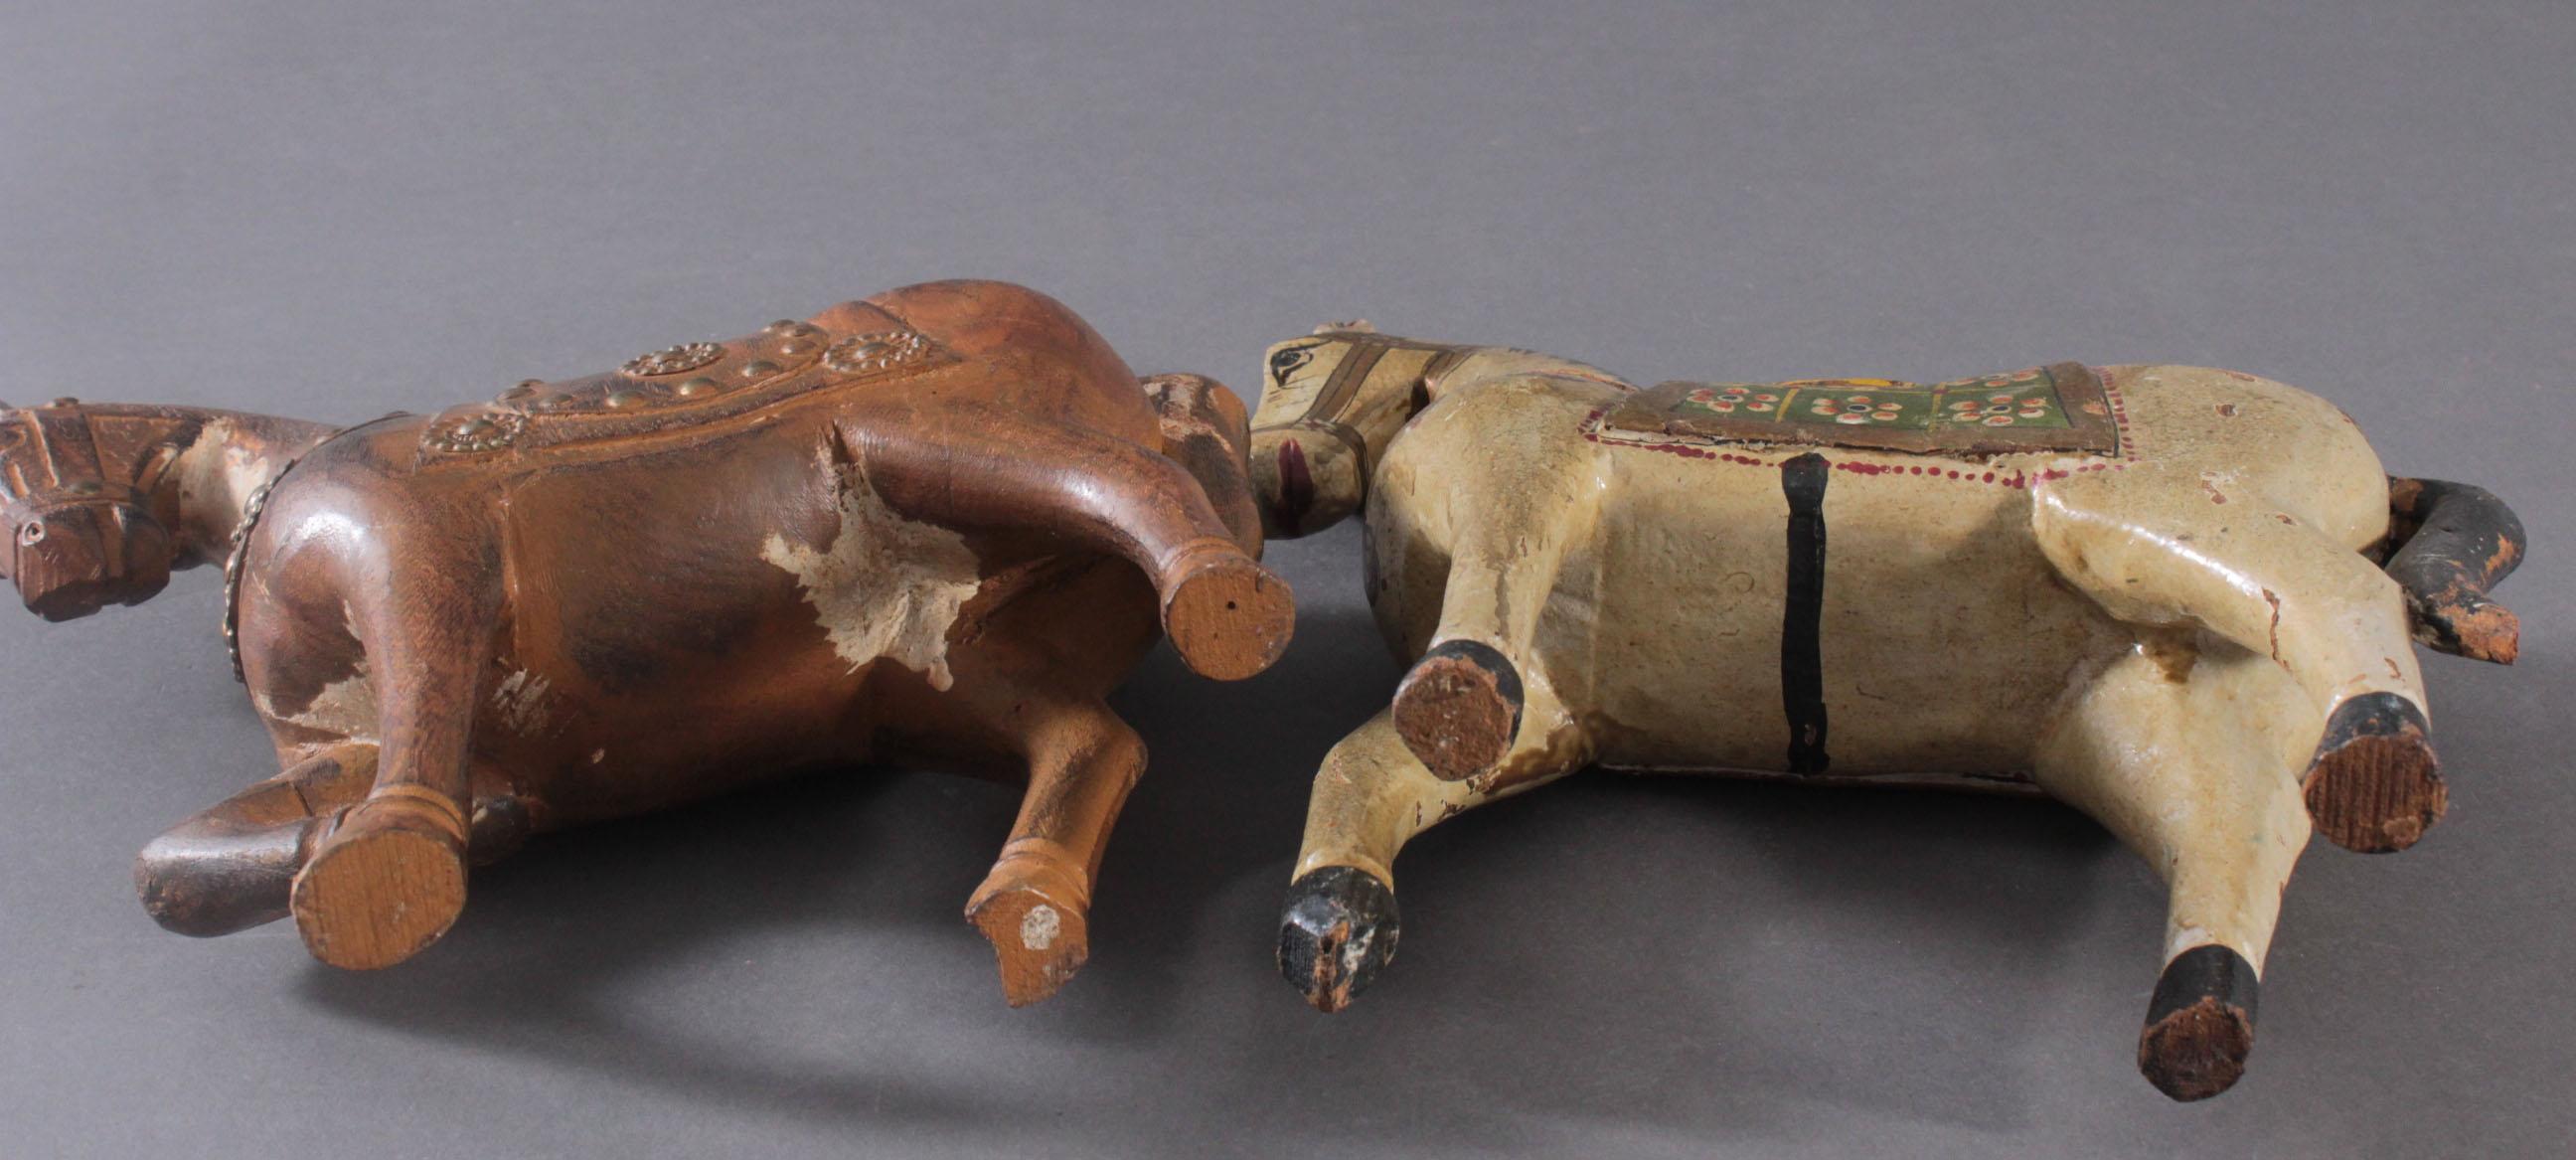 2 Pferdeskulpturen aus Holz 1. Hälfte 20. Jh.-8